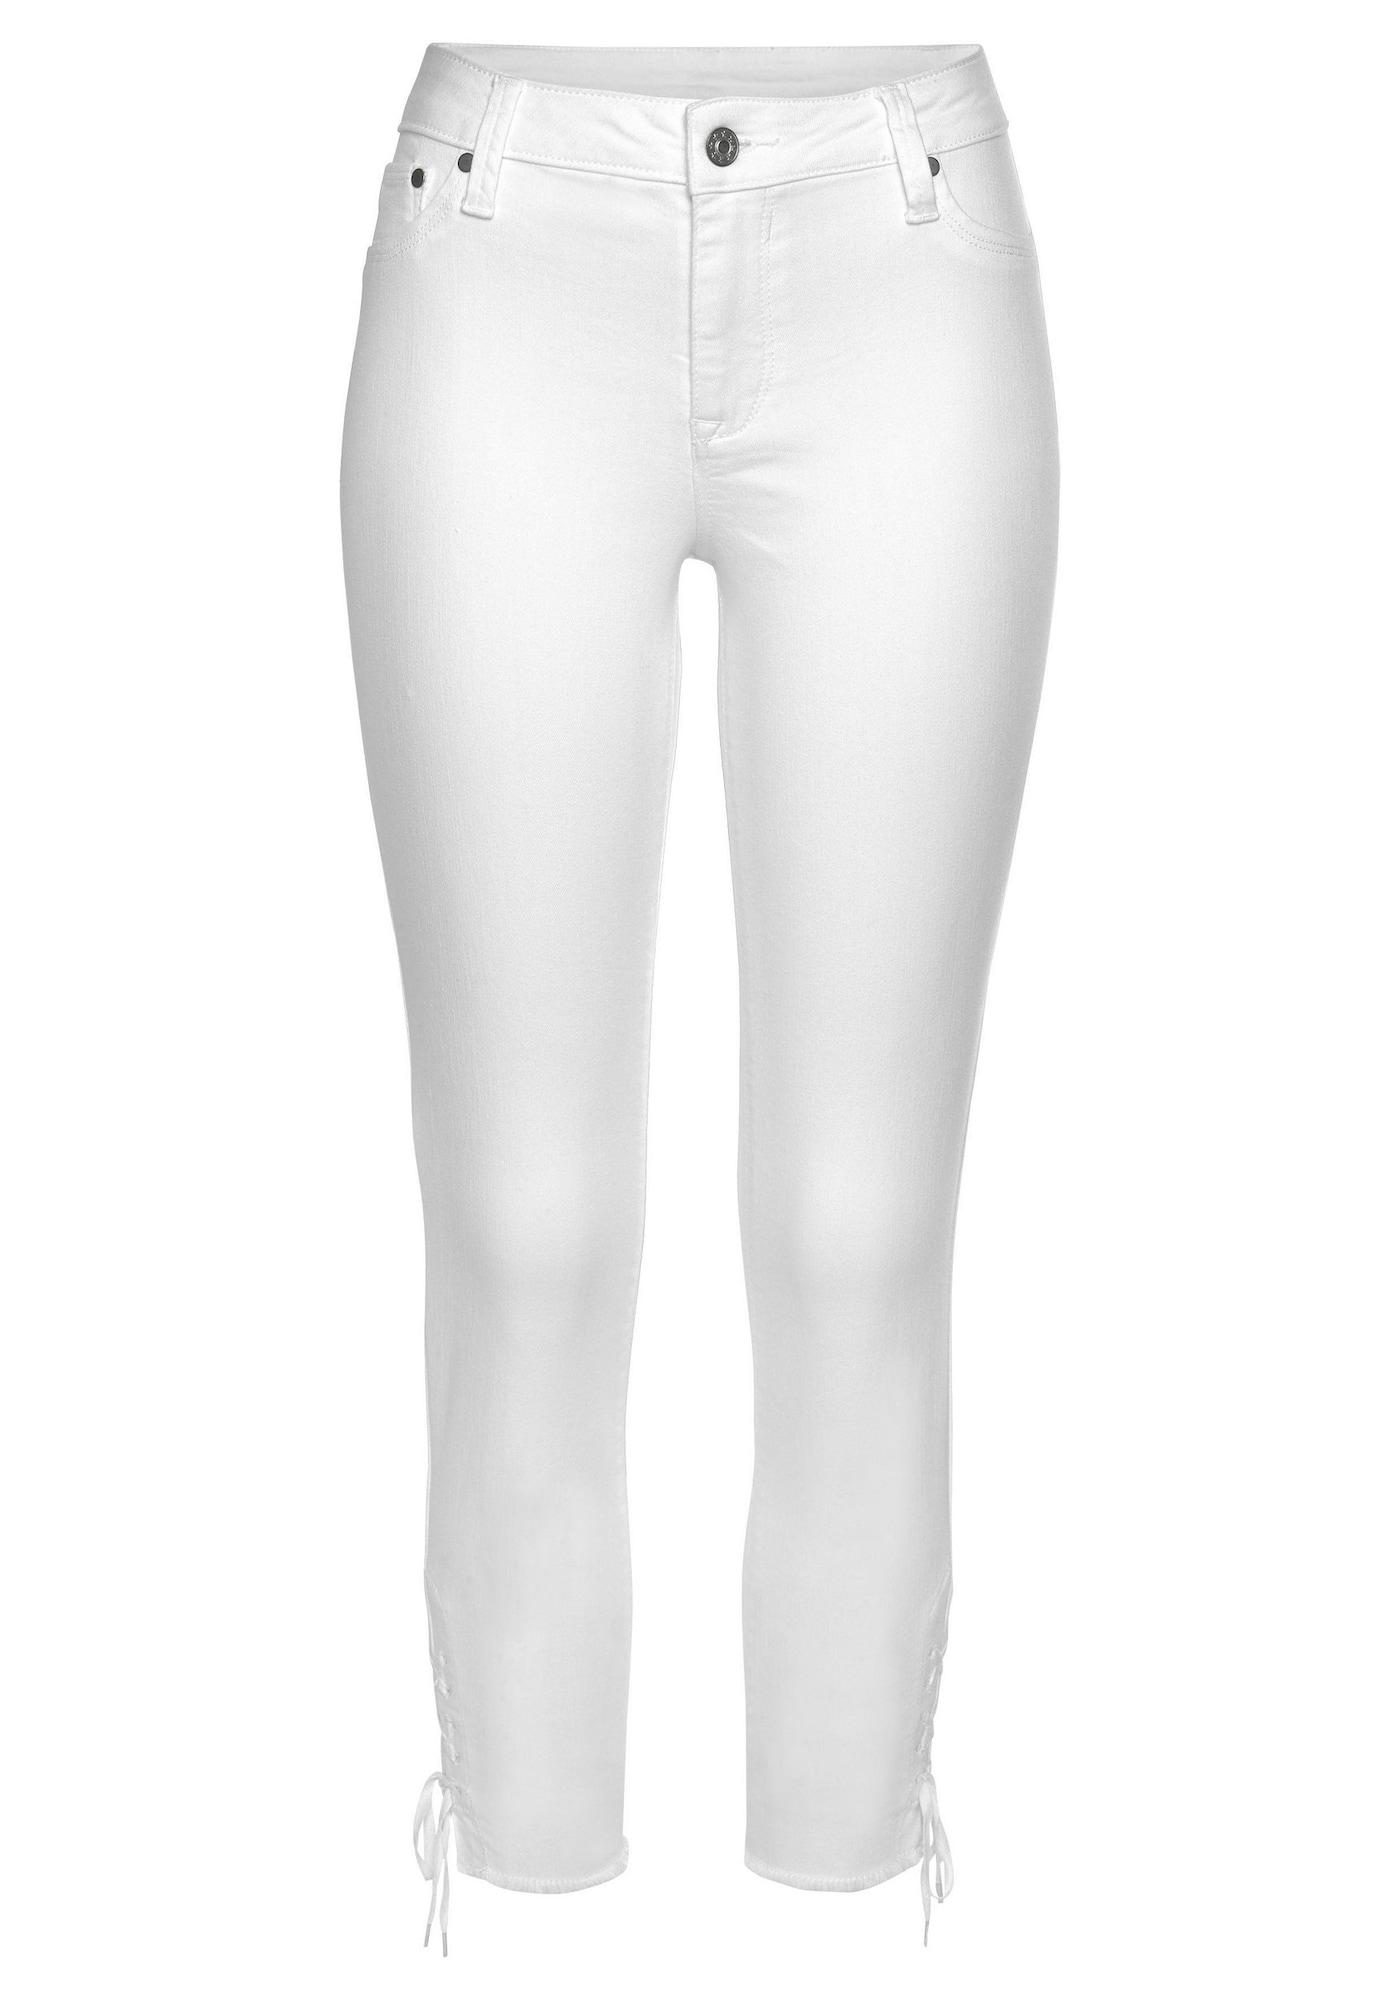 Jeggings   Bekleidung > Jeans > Jeggings   Weiß   Lascana